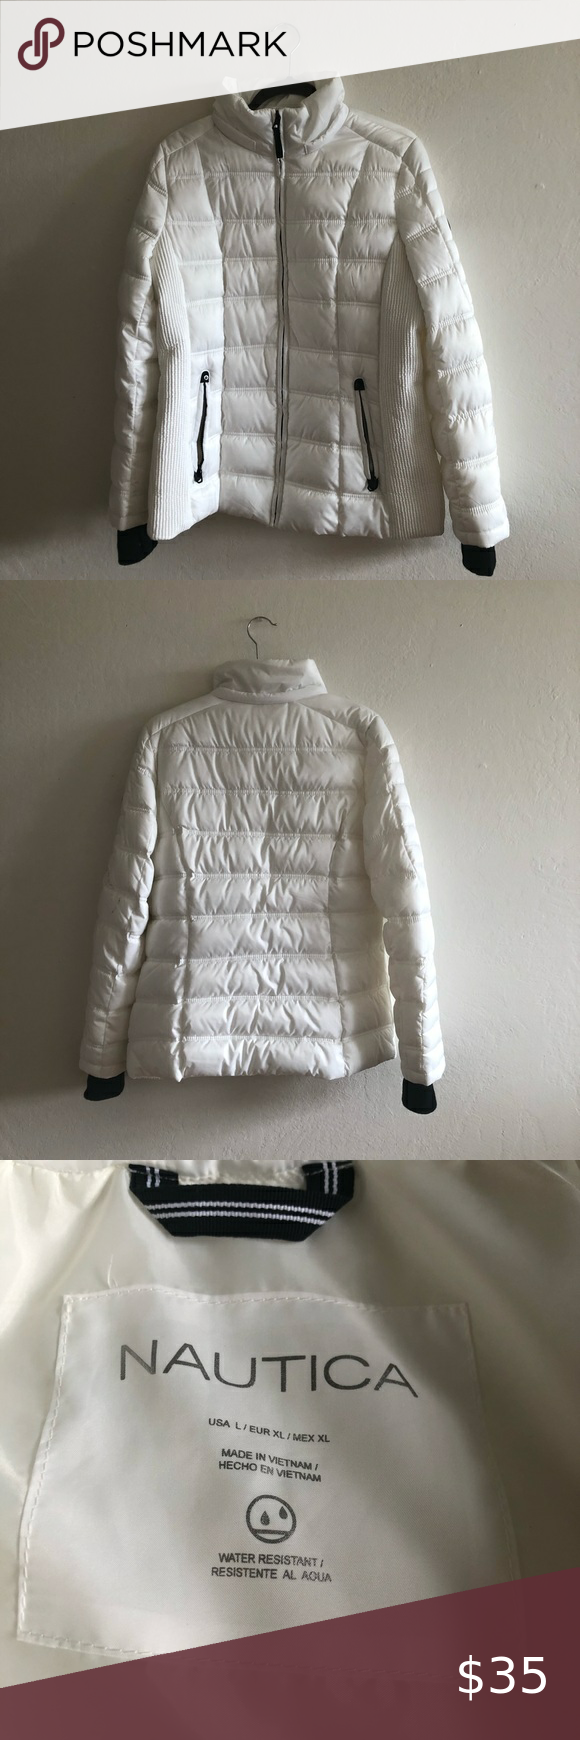 Nautica Large Sip Up Jacket Puffer Jacket Women Coats Jackets Women Green Puffy Coat [ 1740 x 580 Pixel ]